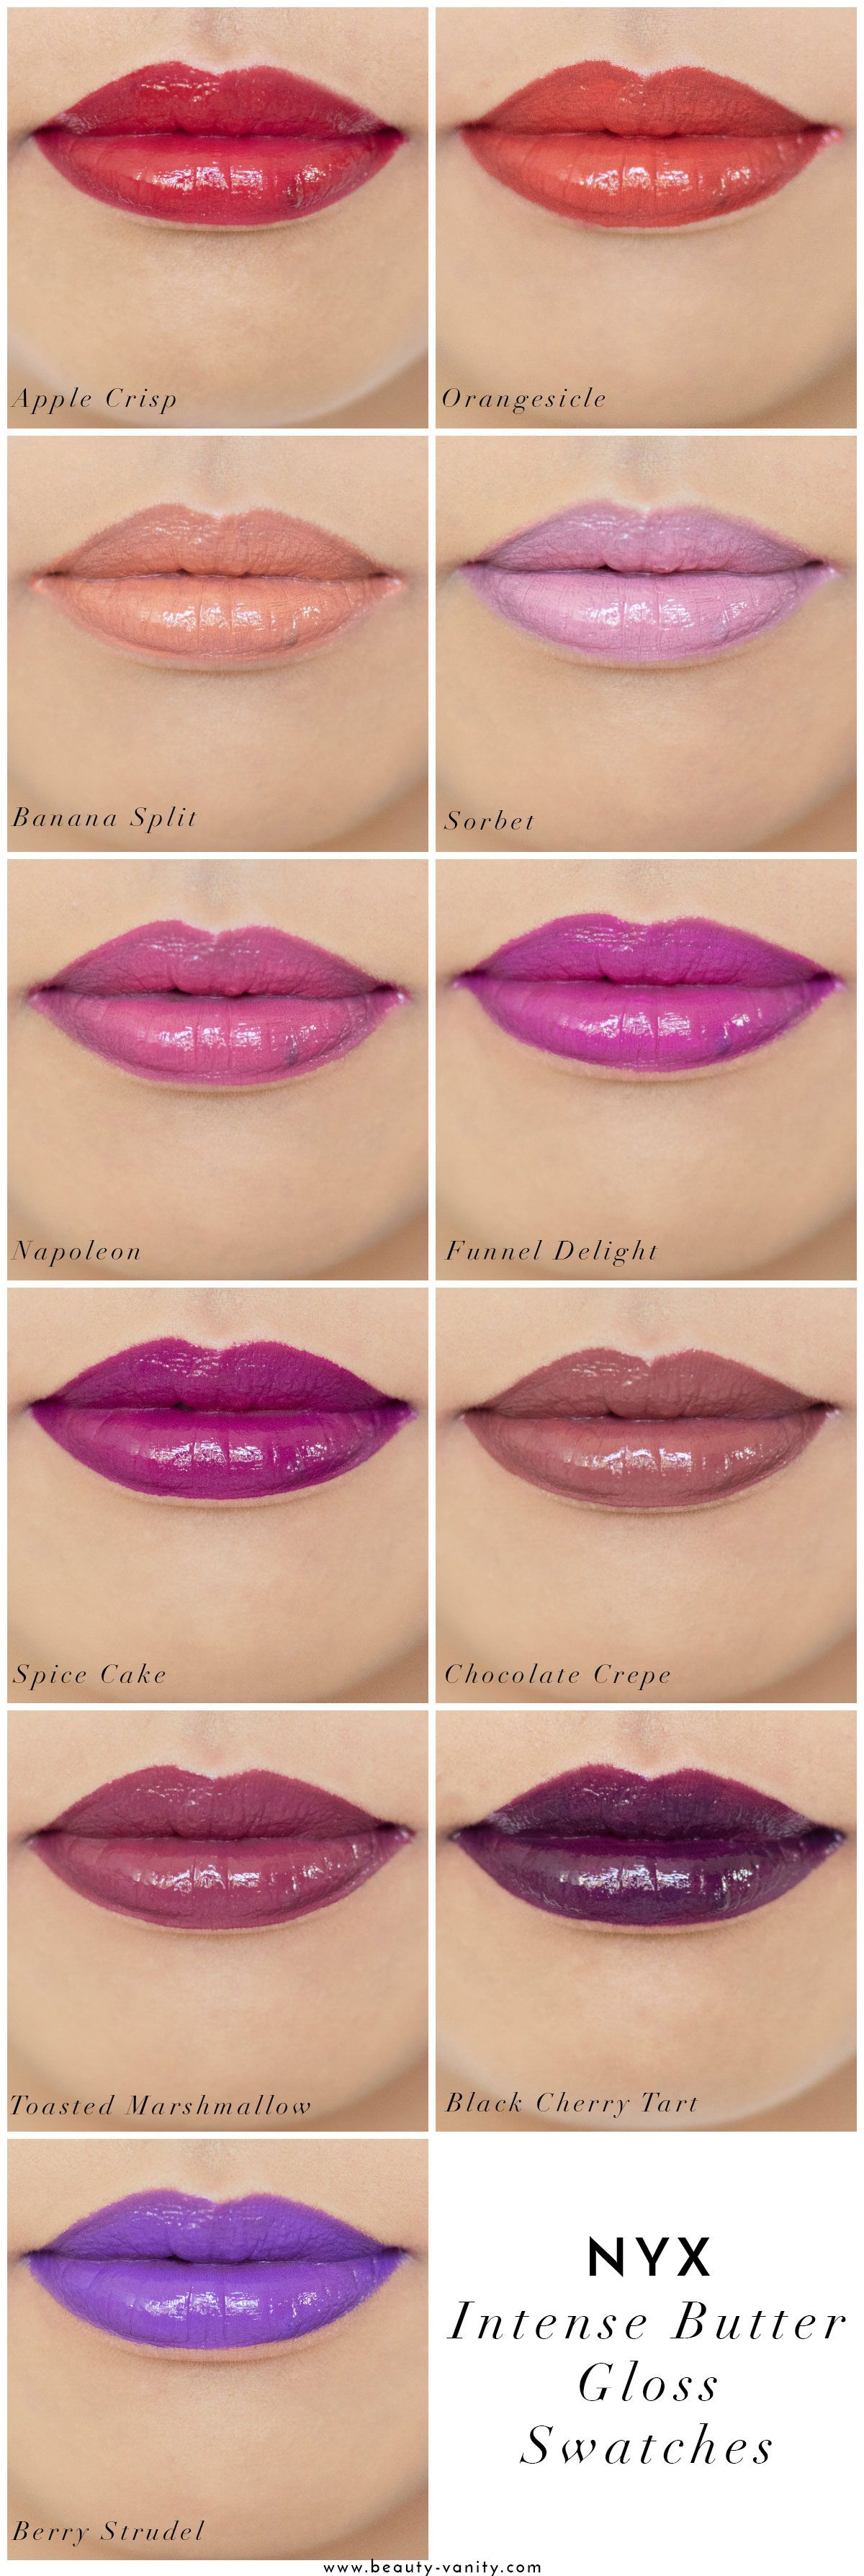 NYX Extra Creamy Round Lipsticks in Indian Pink, Tea Rose